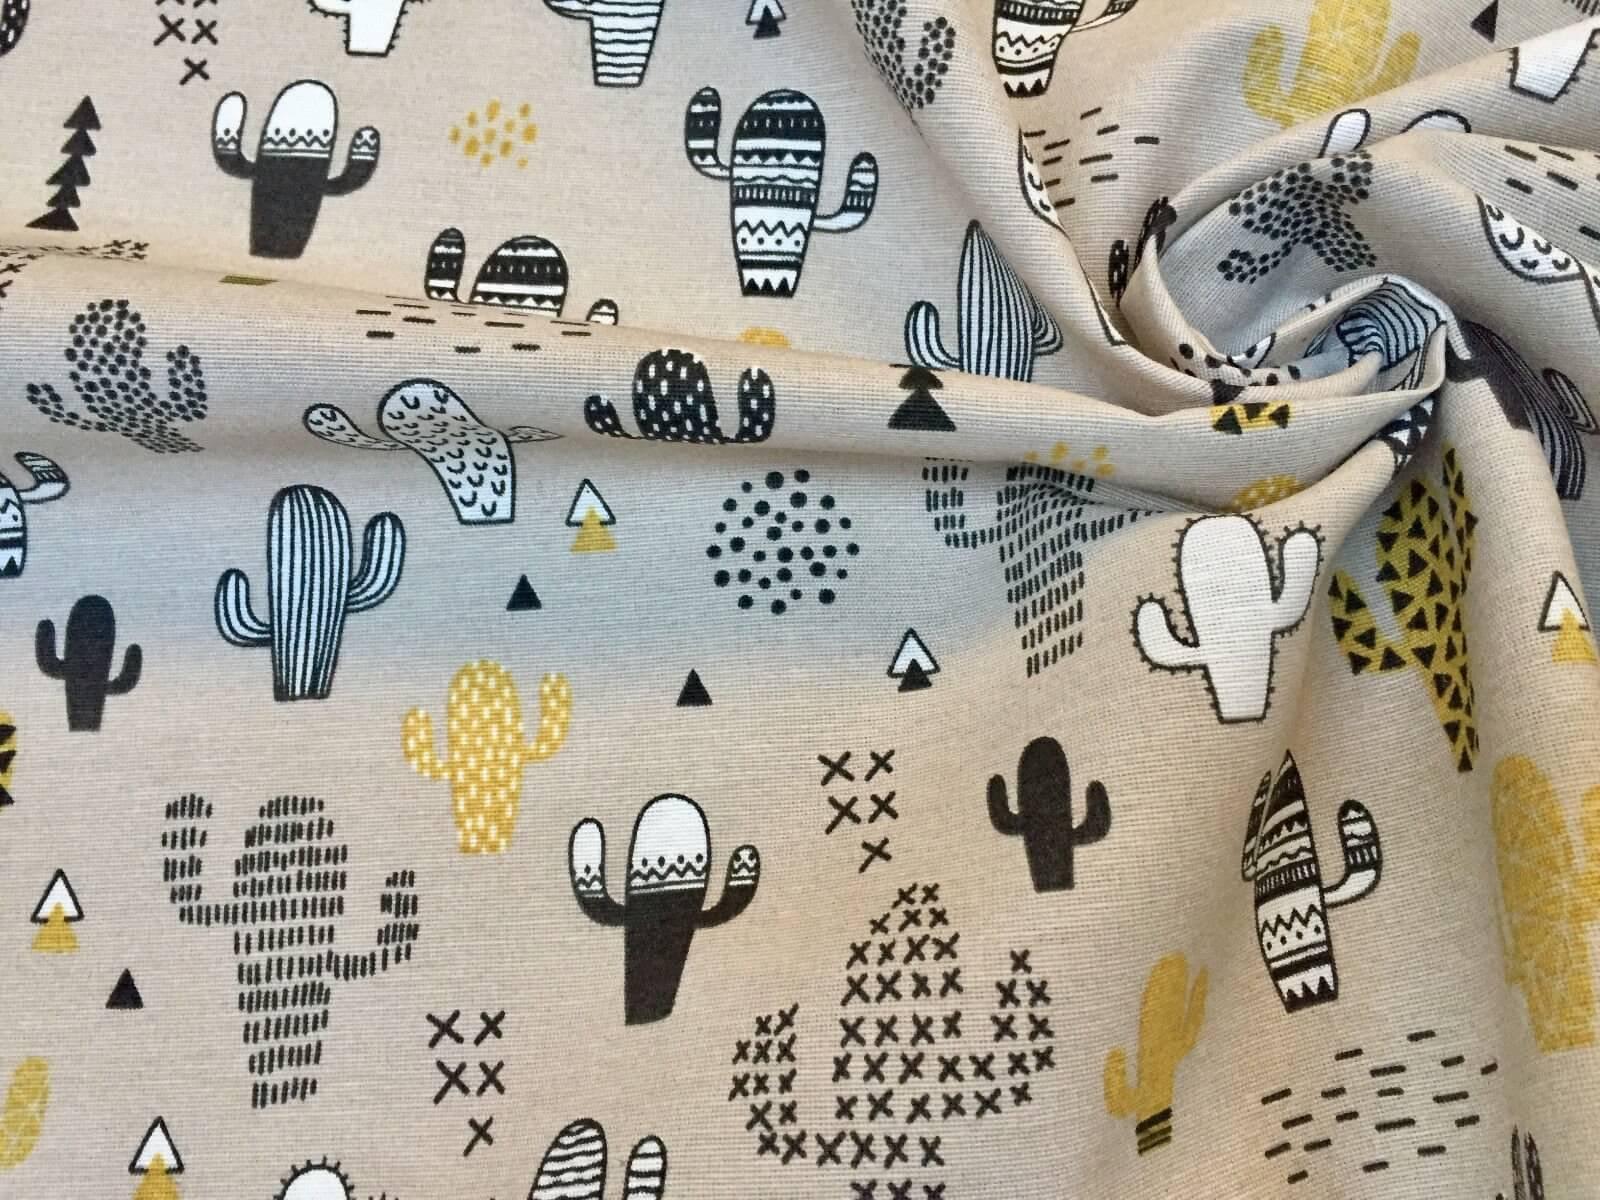 mustard-black-cactus-fabric-cacti-print-kid-curtain-cotton-material-55-inches-wide-5b4caecd5.jpg